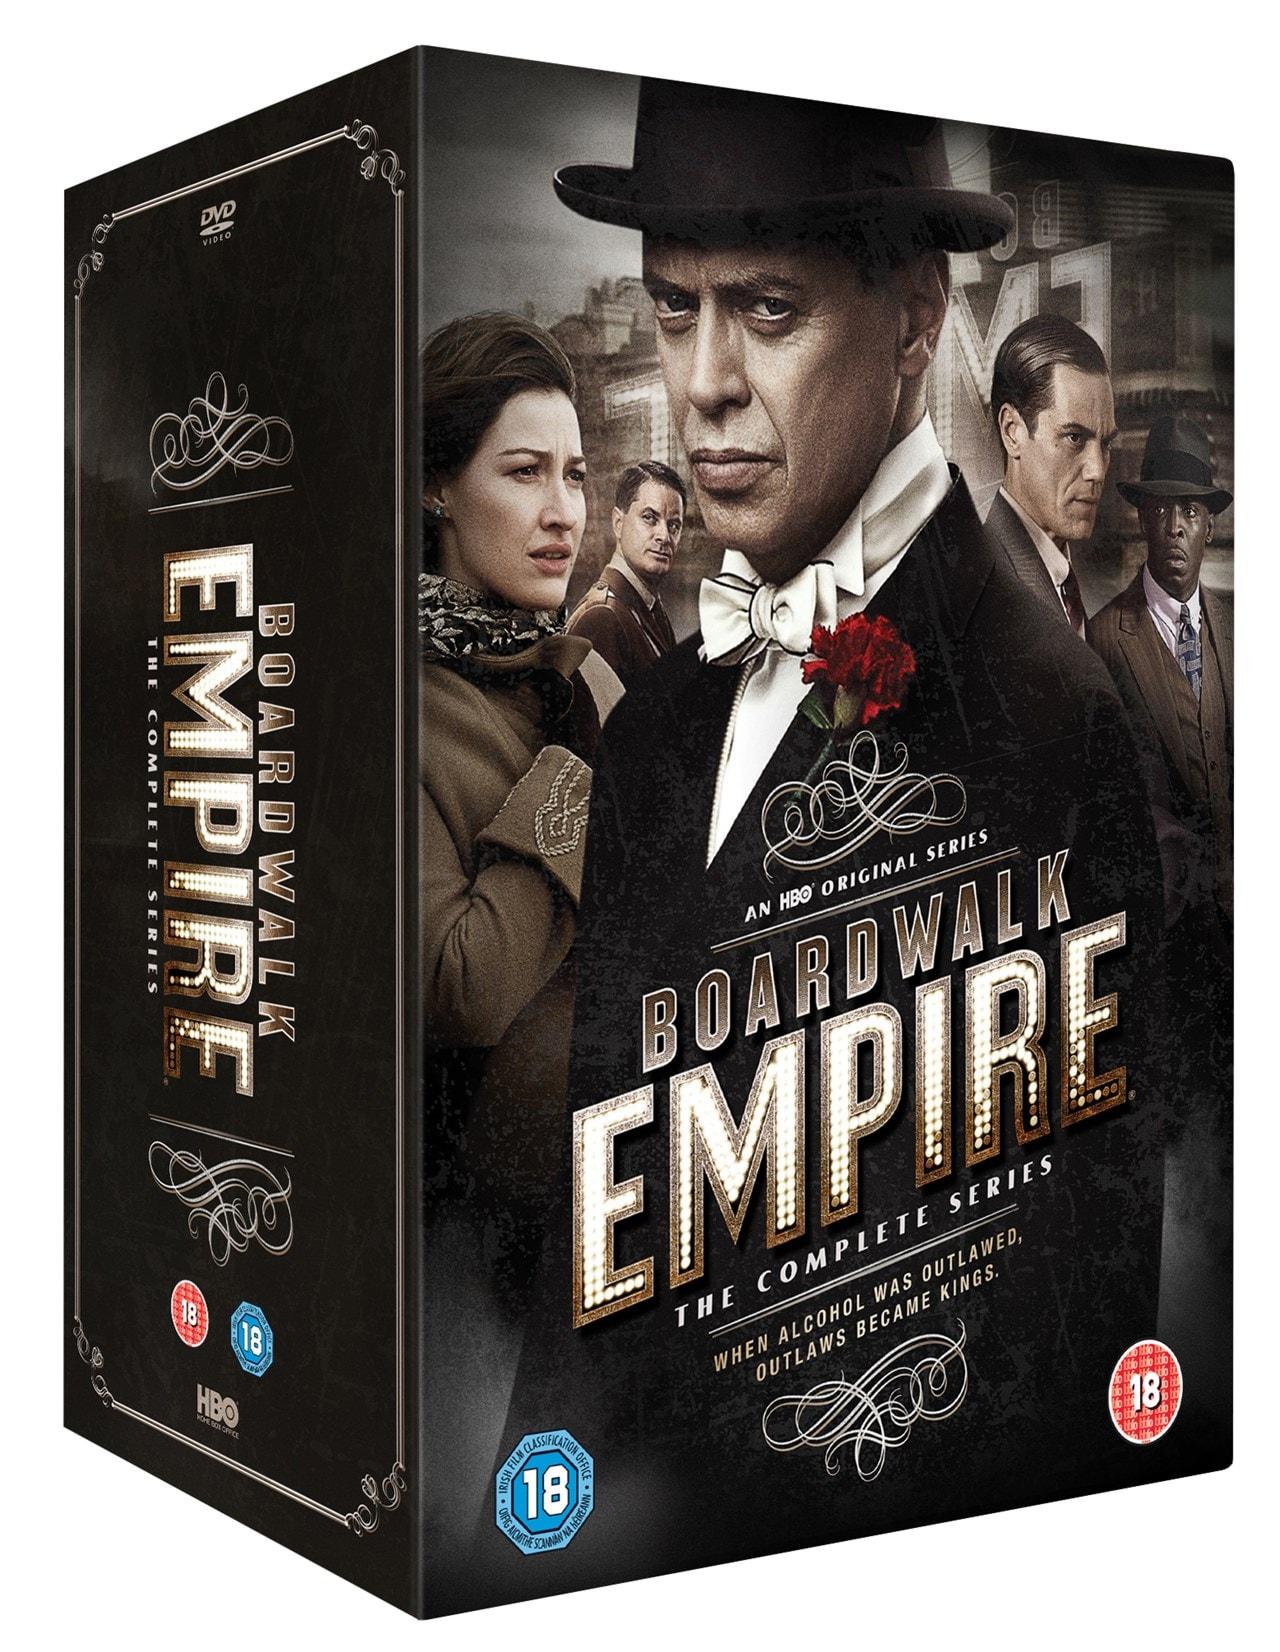 Boardwalk Empire: The Complete Series - 2